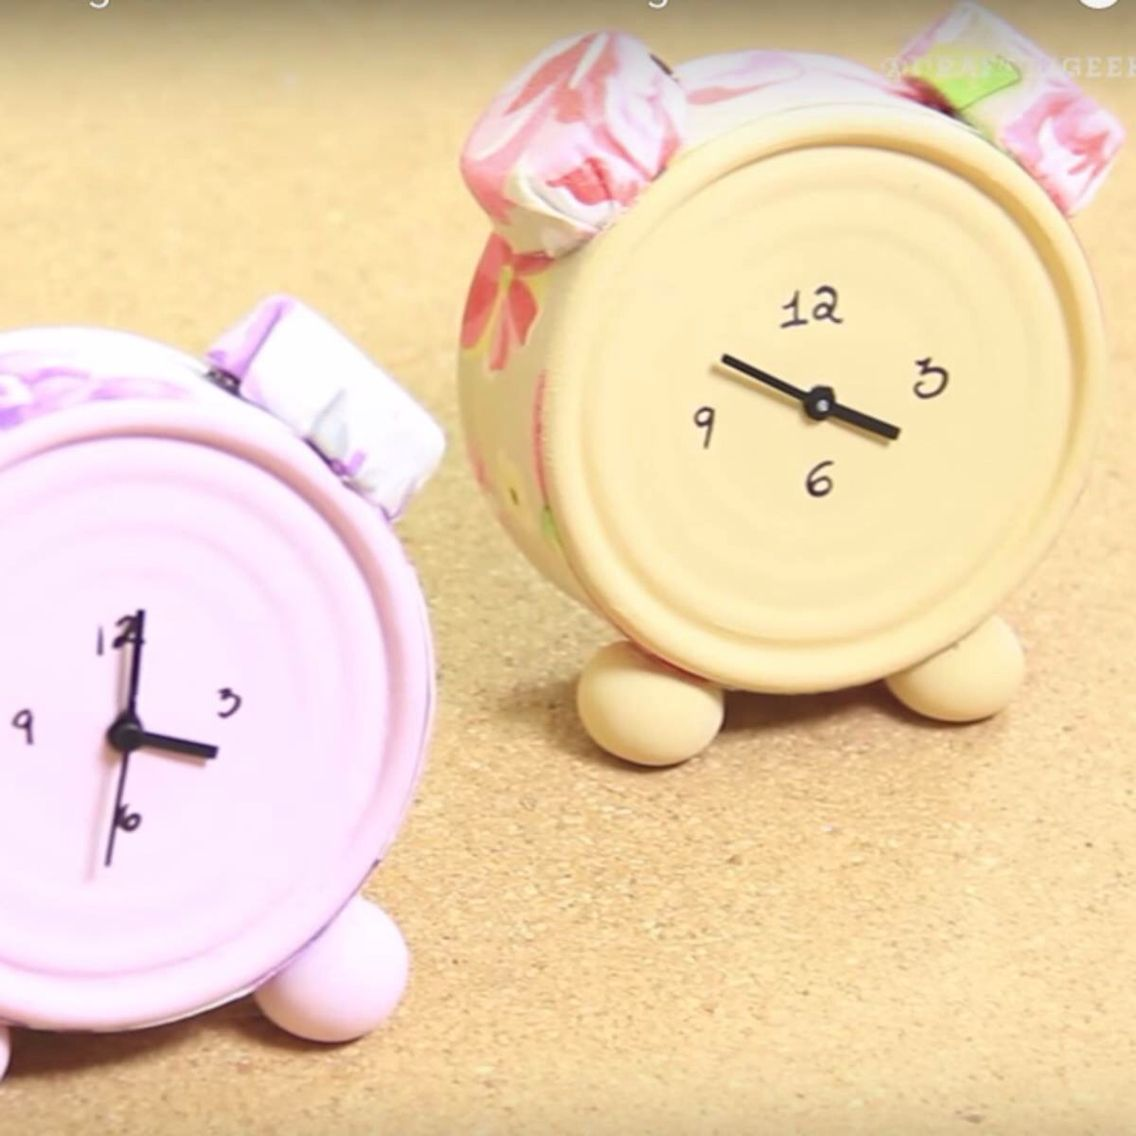 50 manualidades con latas de at n - Manualidades relojes de pared ...